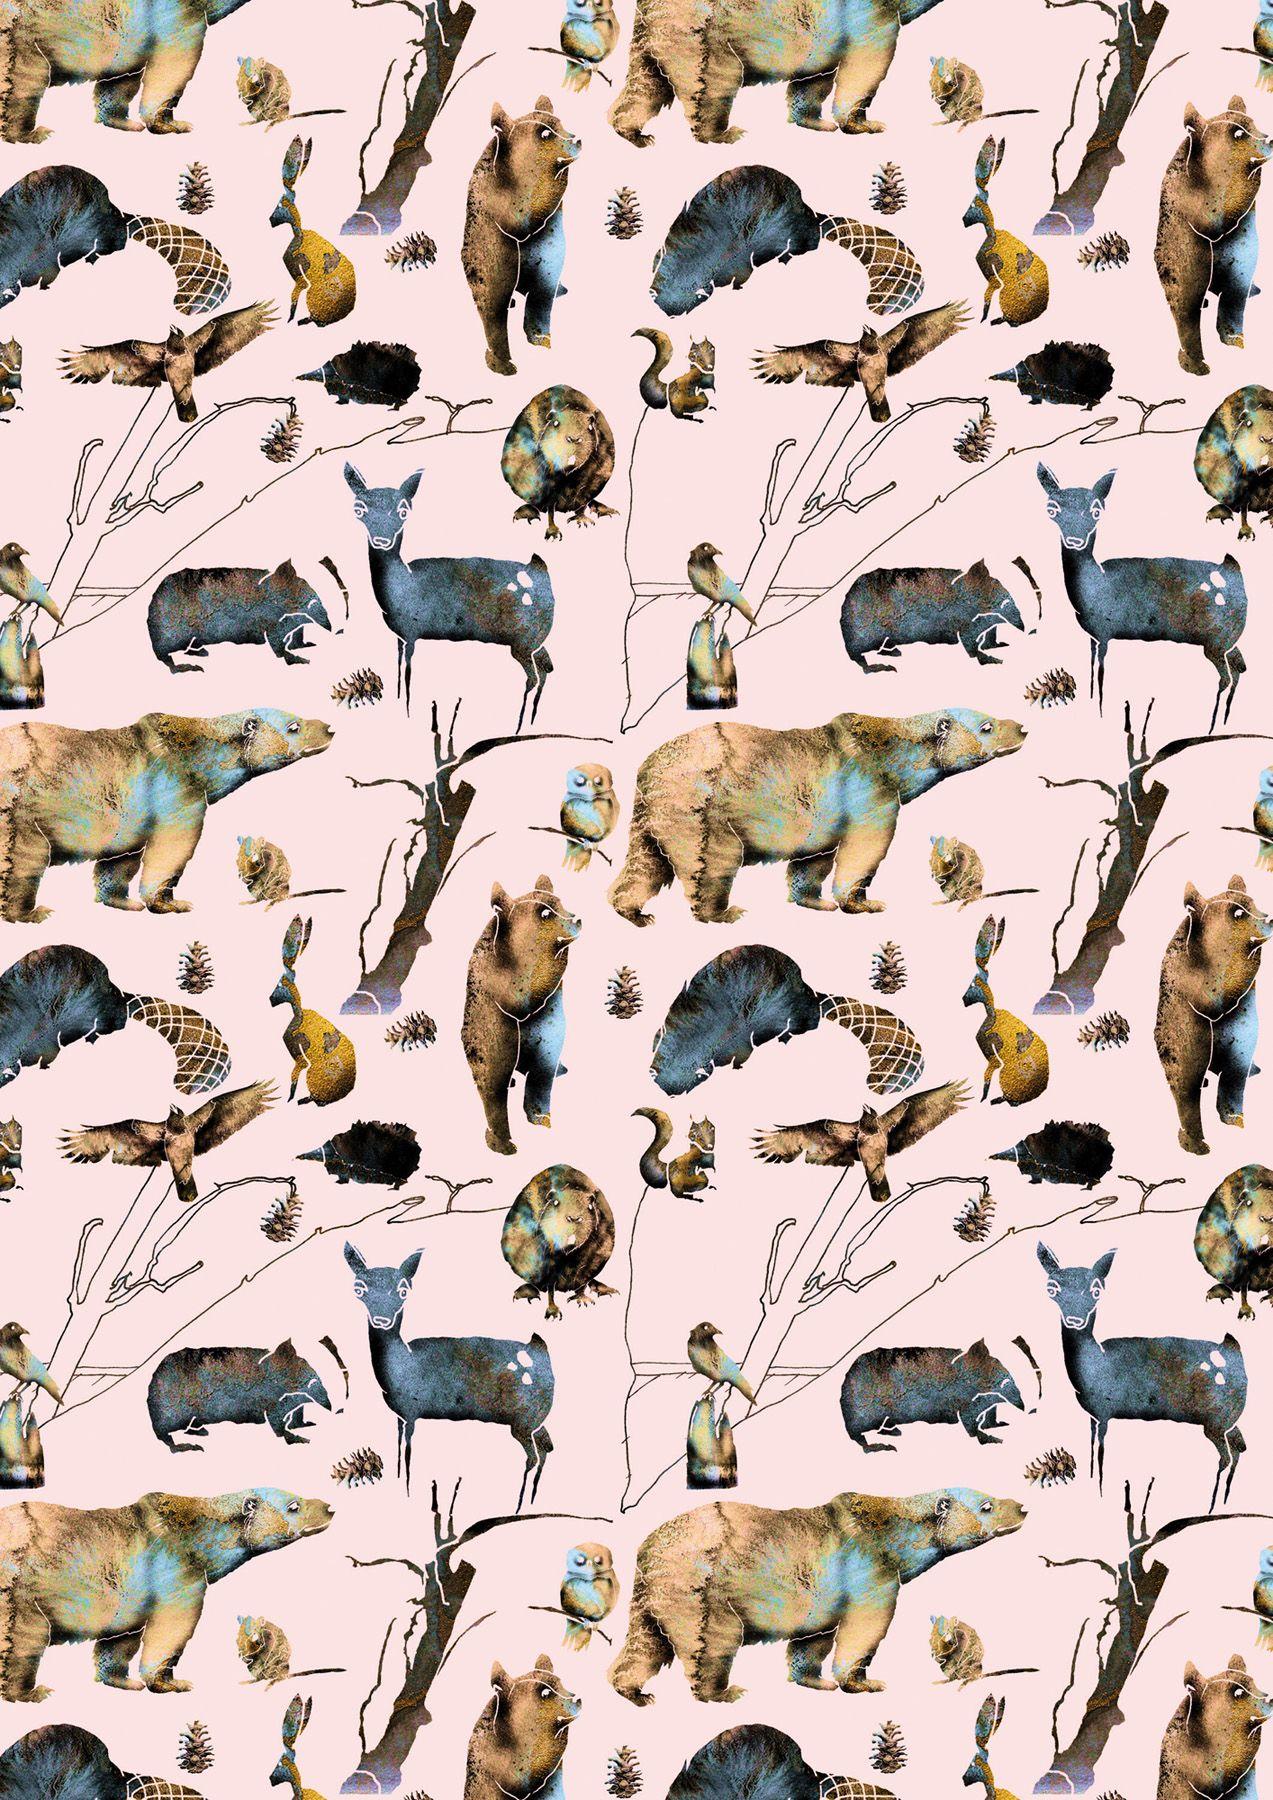 Download Wallpaper Horse Collage - 41109fe468aaa28b80f700d1f287d523  Snapshot_1002419.jpg